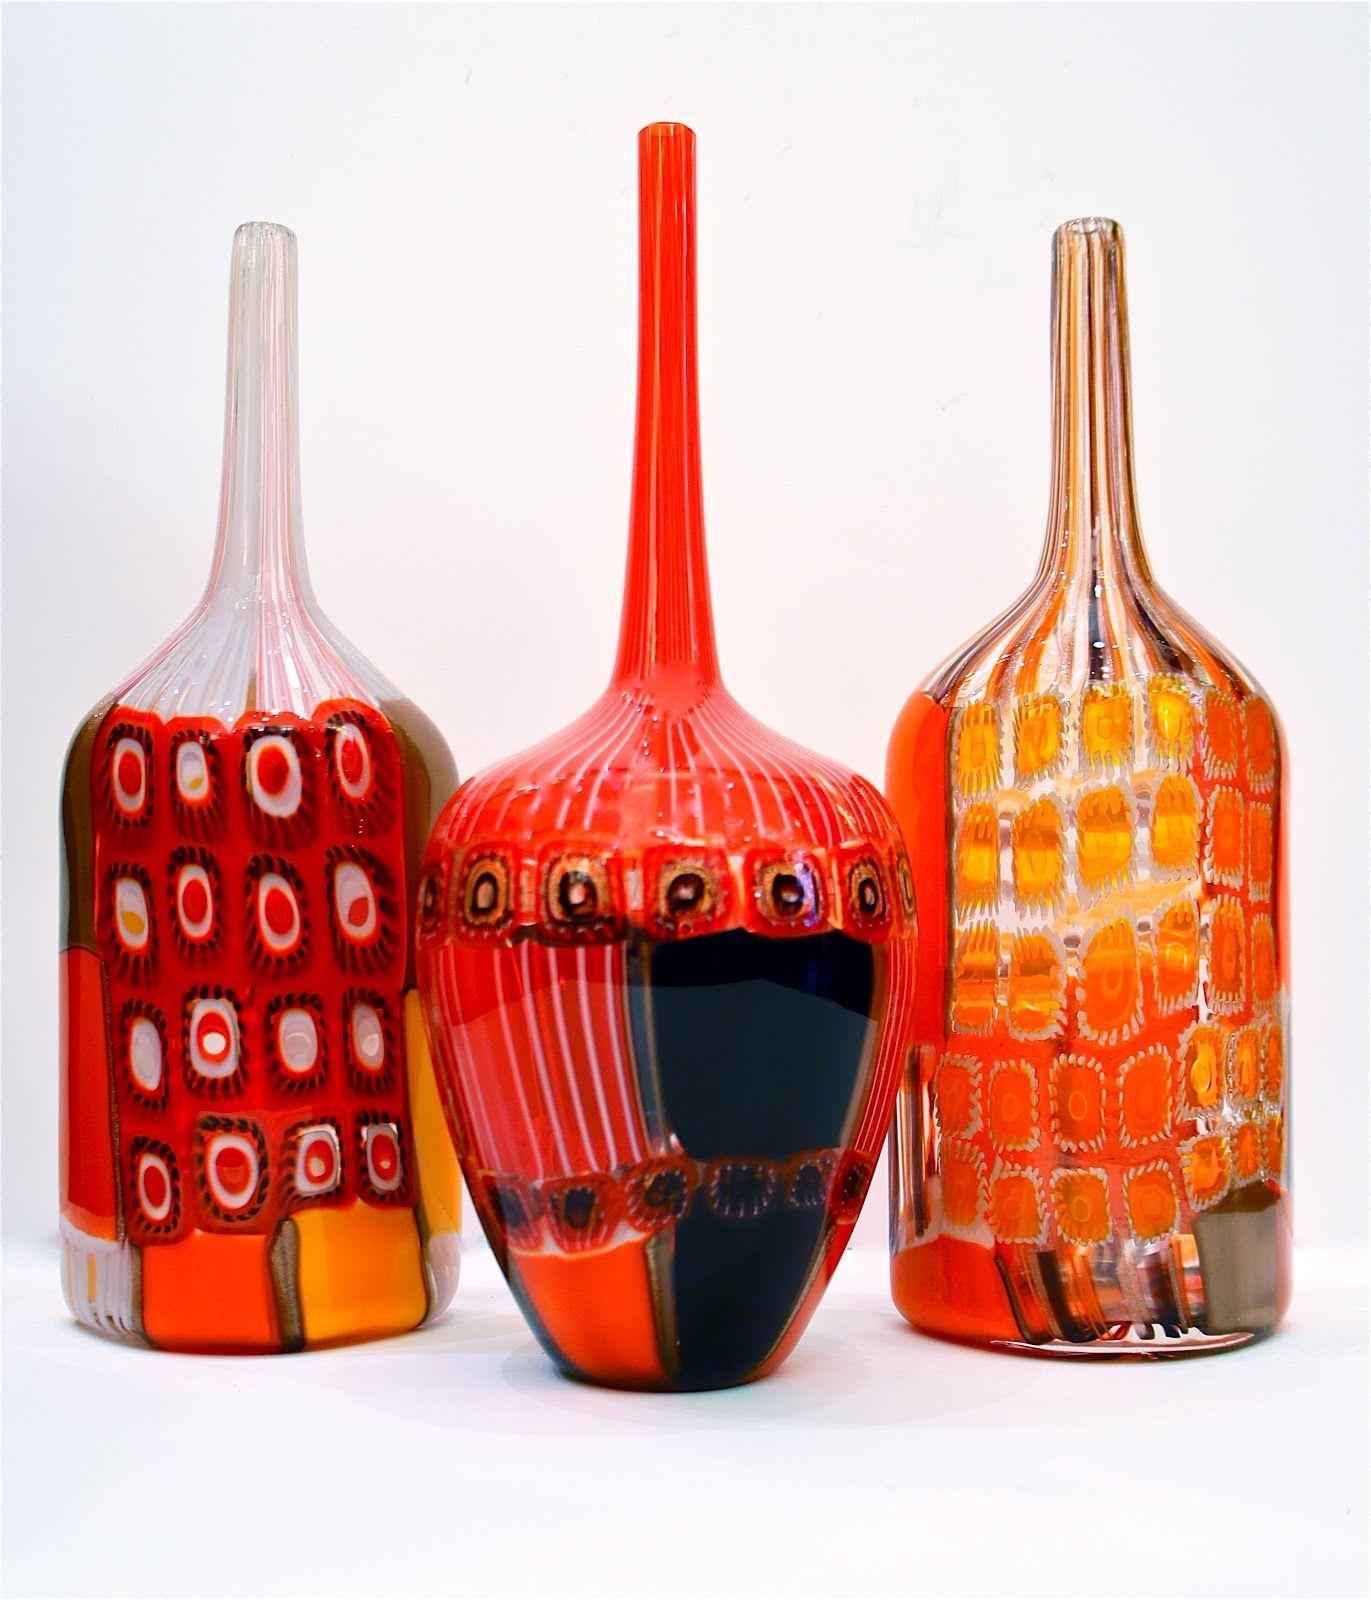 Franco Moretti Glass Art Gorgeous Glass Ceramic Design